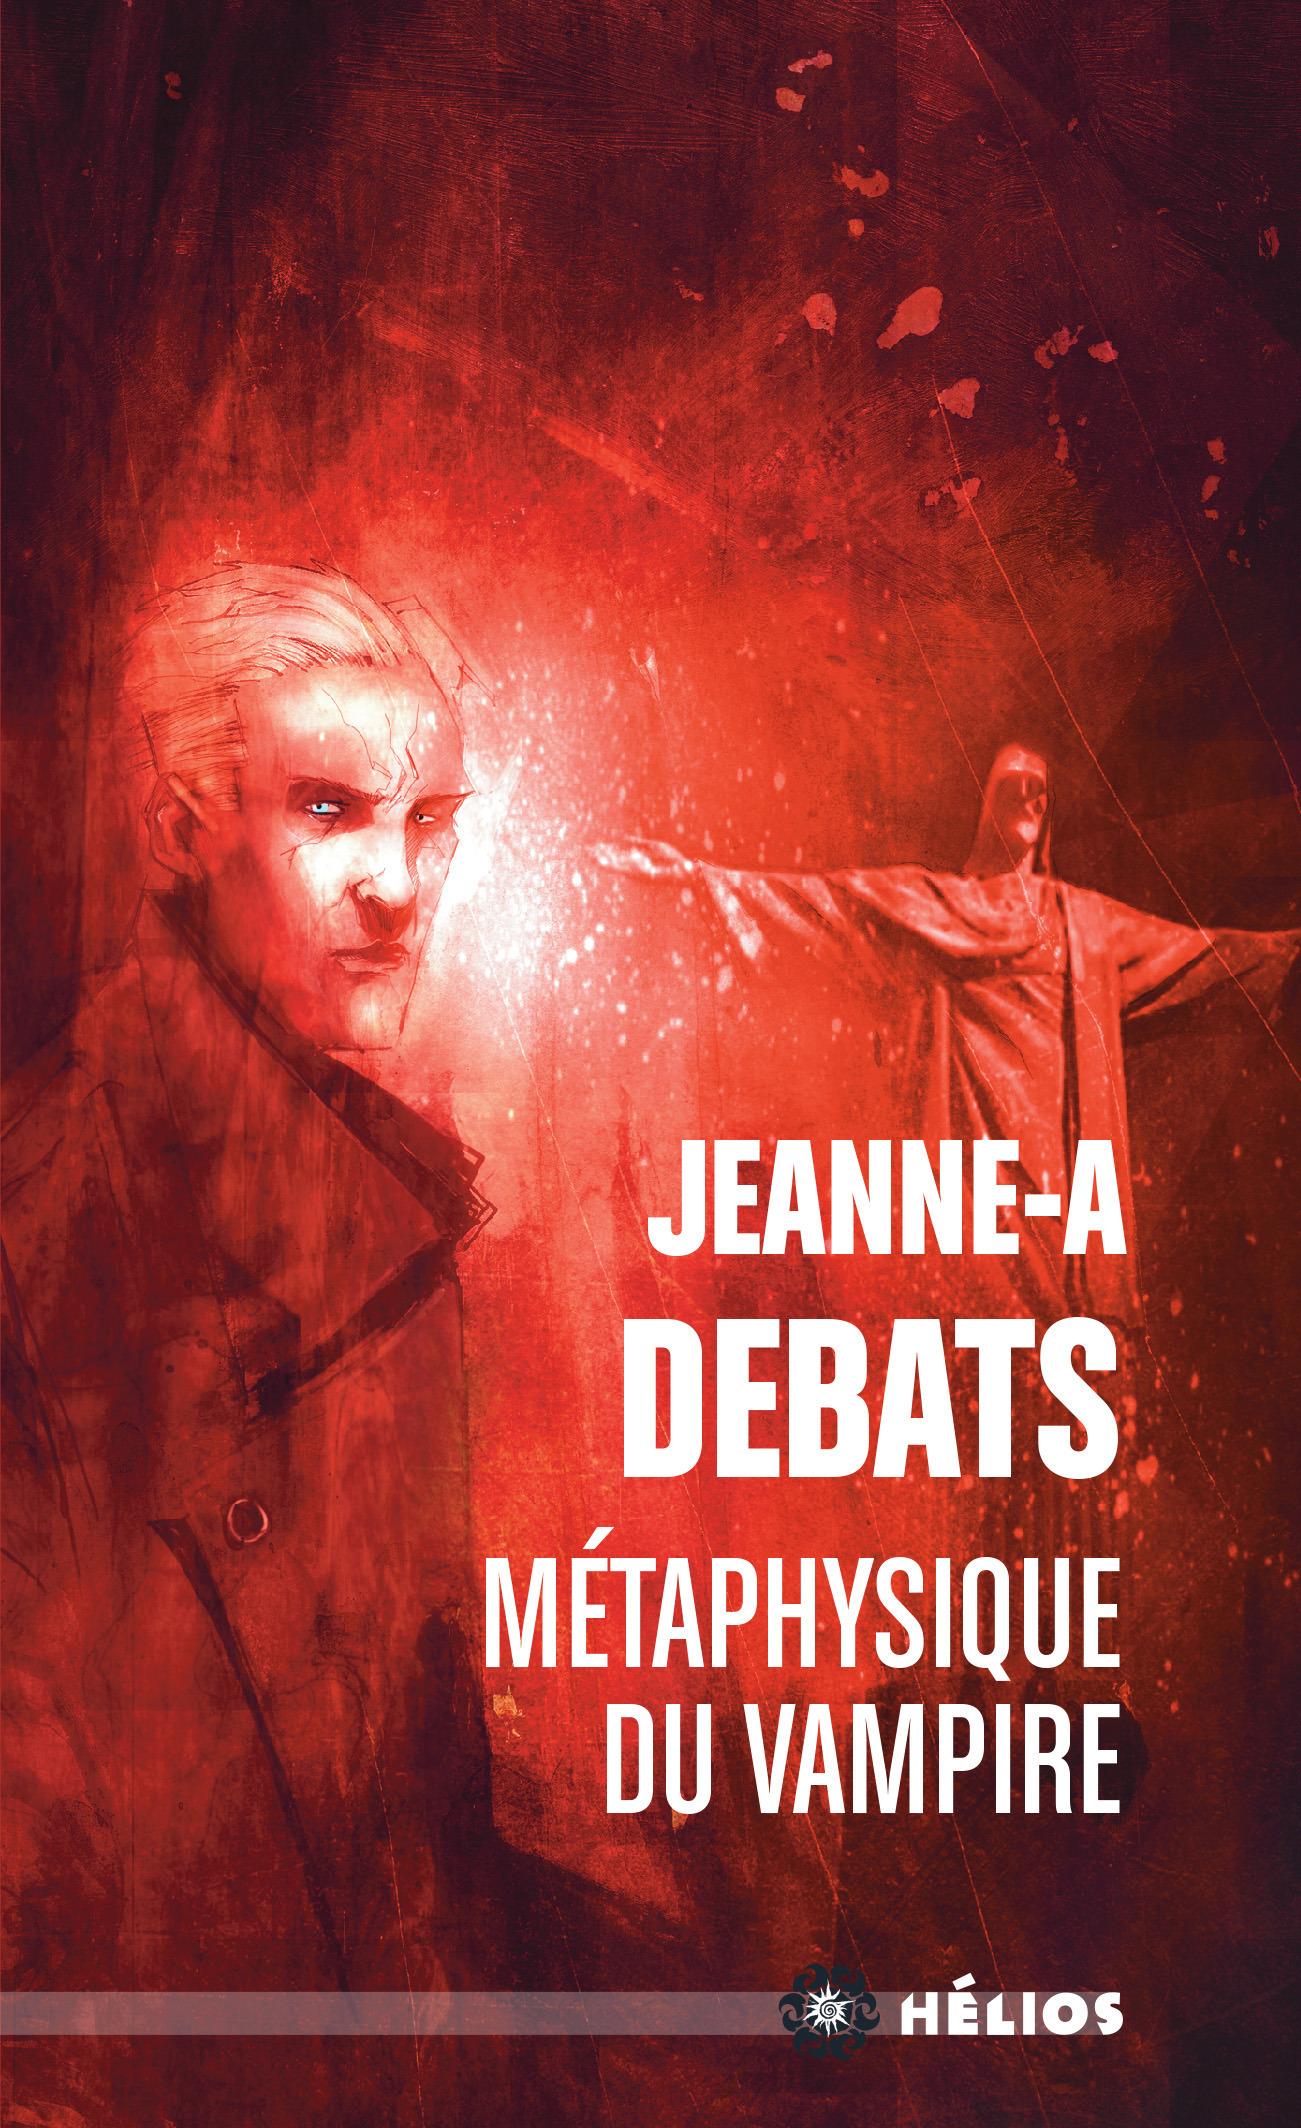 Metaphysique du vampire